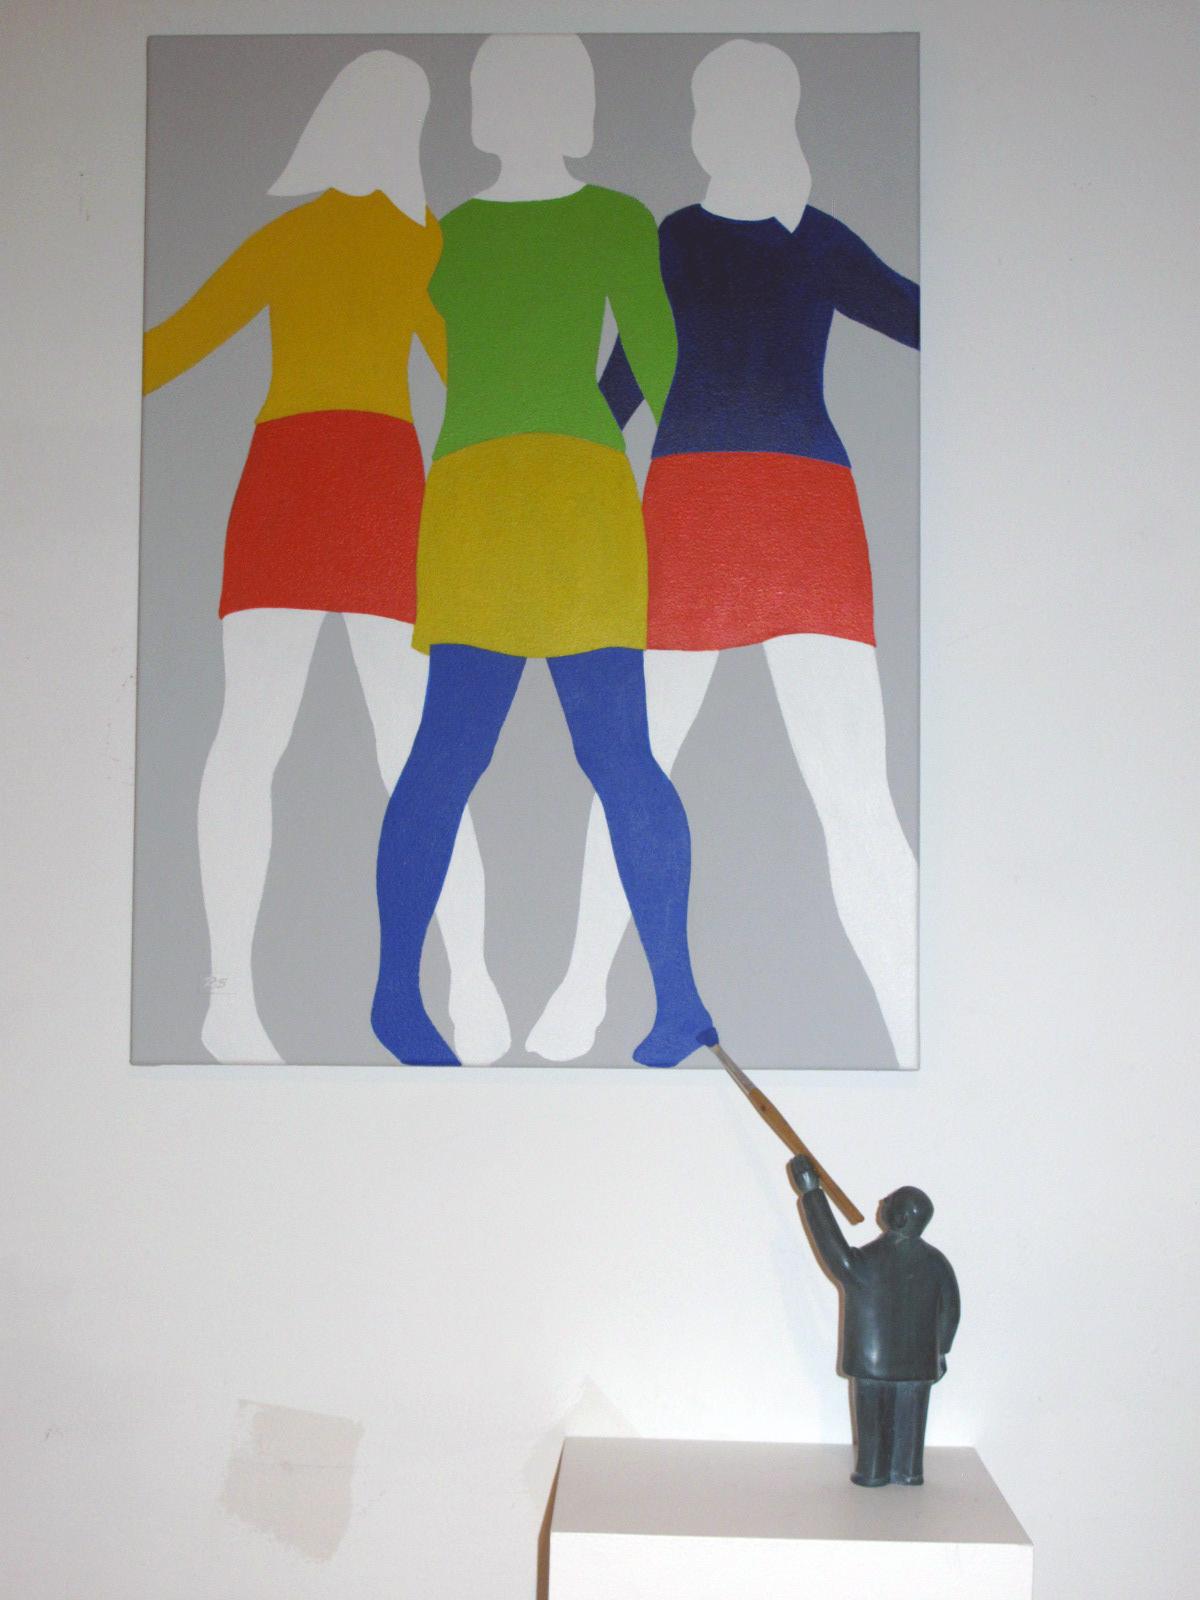 Reinhard_Skoracki_Girls,Girls,Girls_95x50x20cm_edof3_2014_$3400